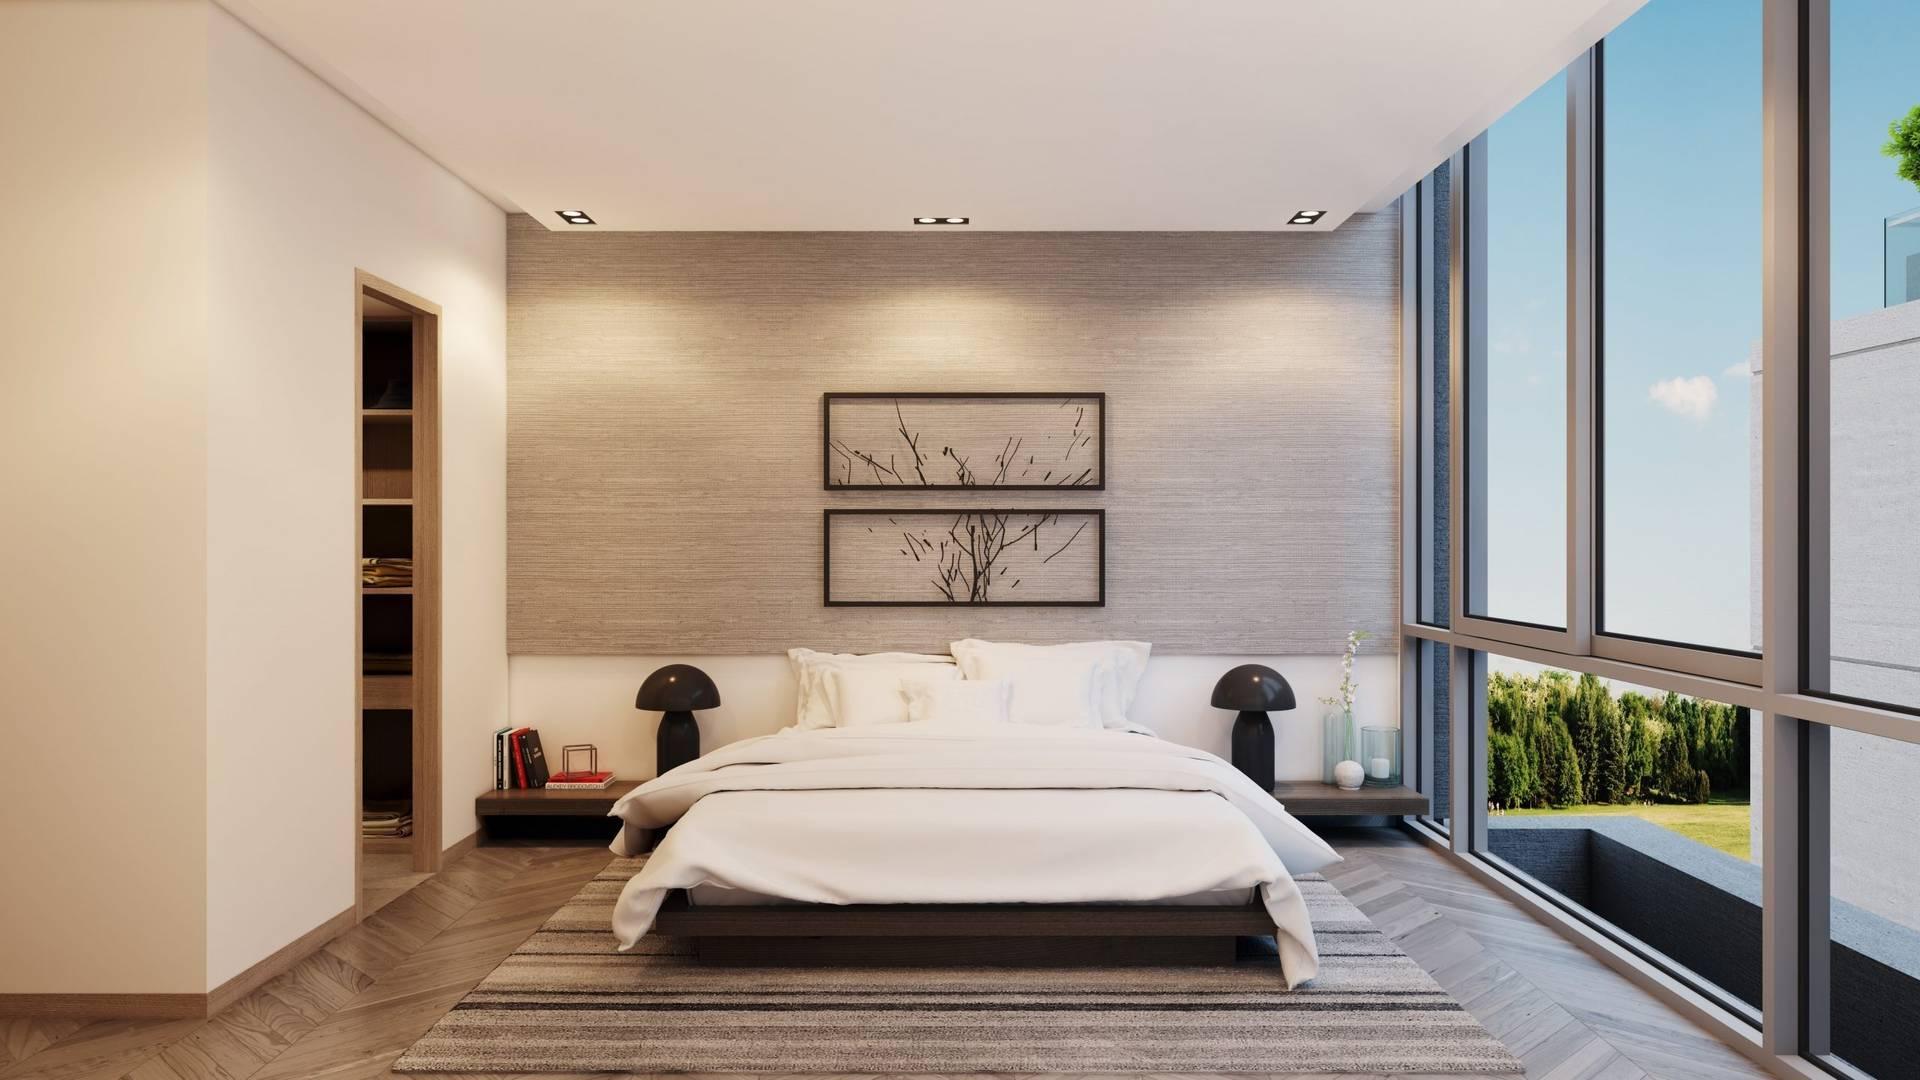 Eco Friendly Home | Stylish | Spacious